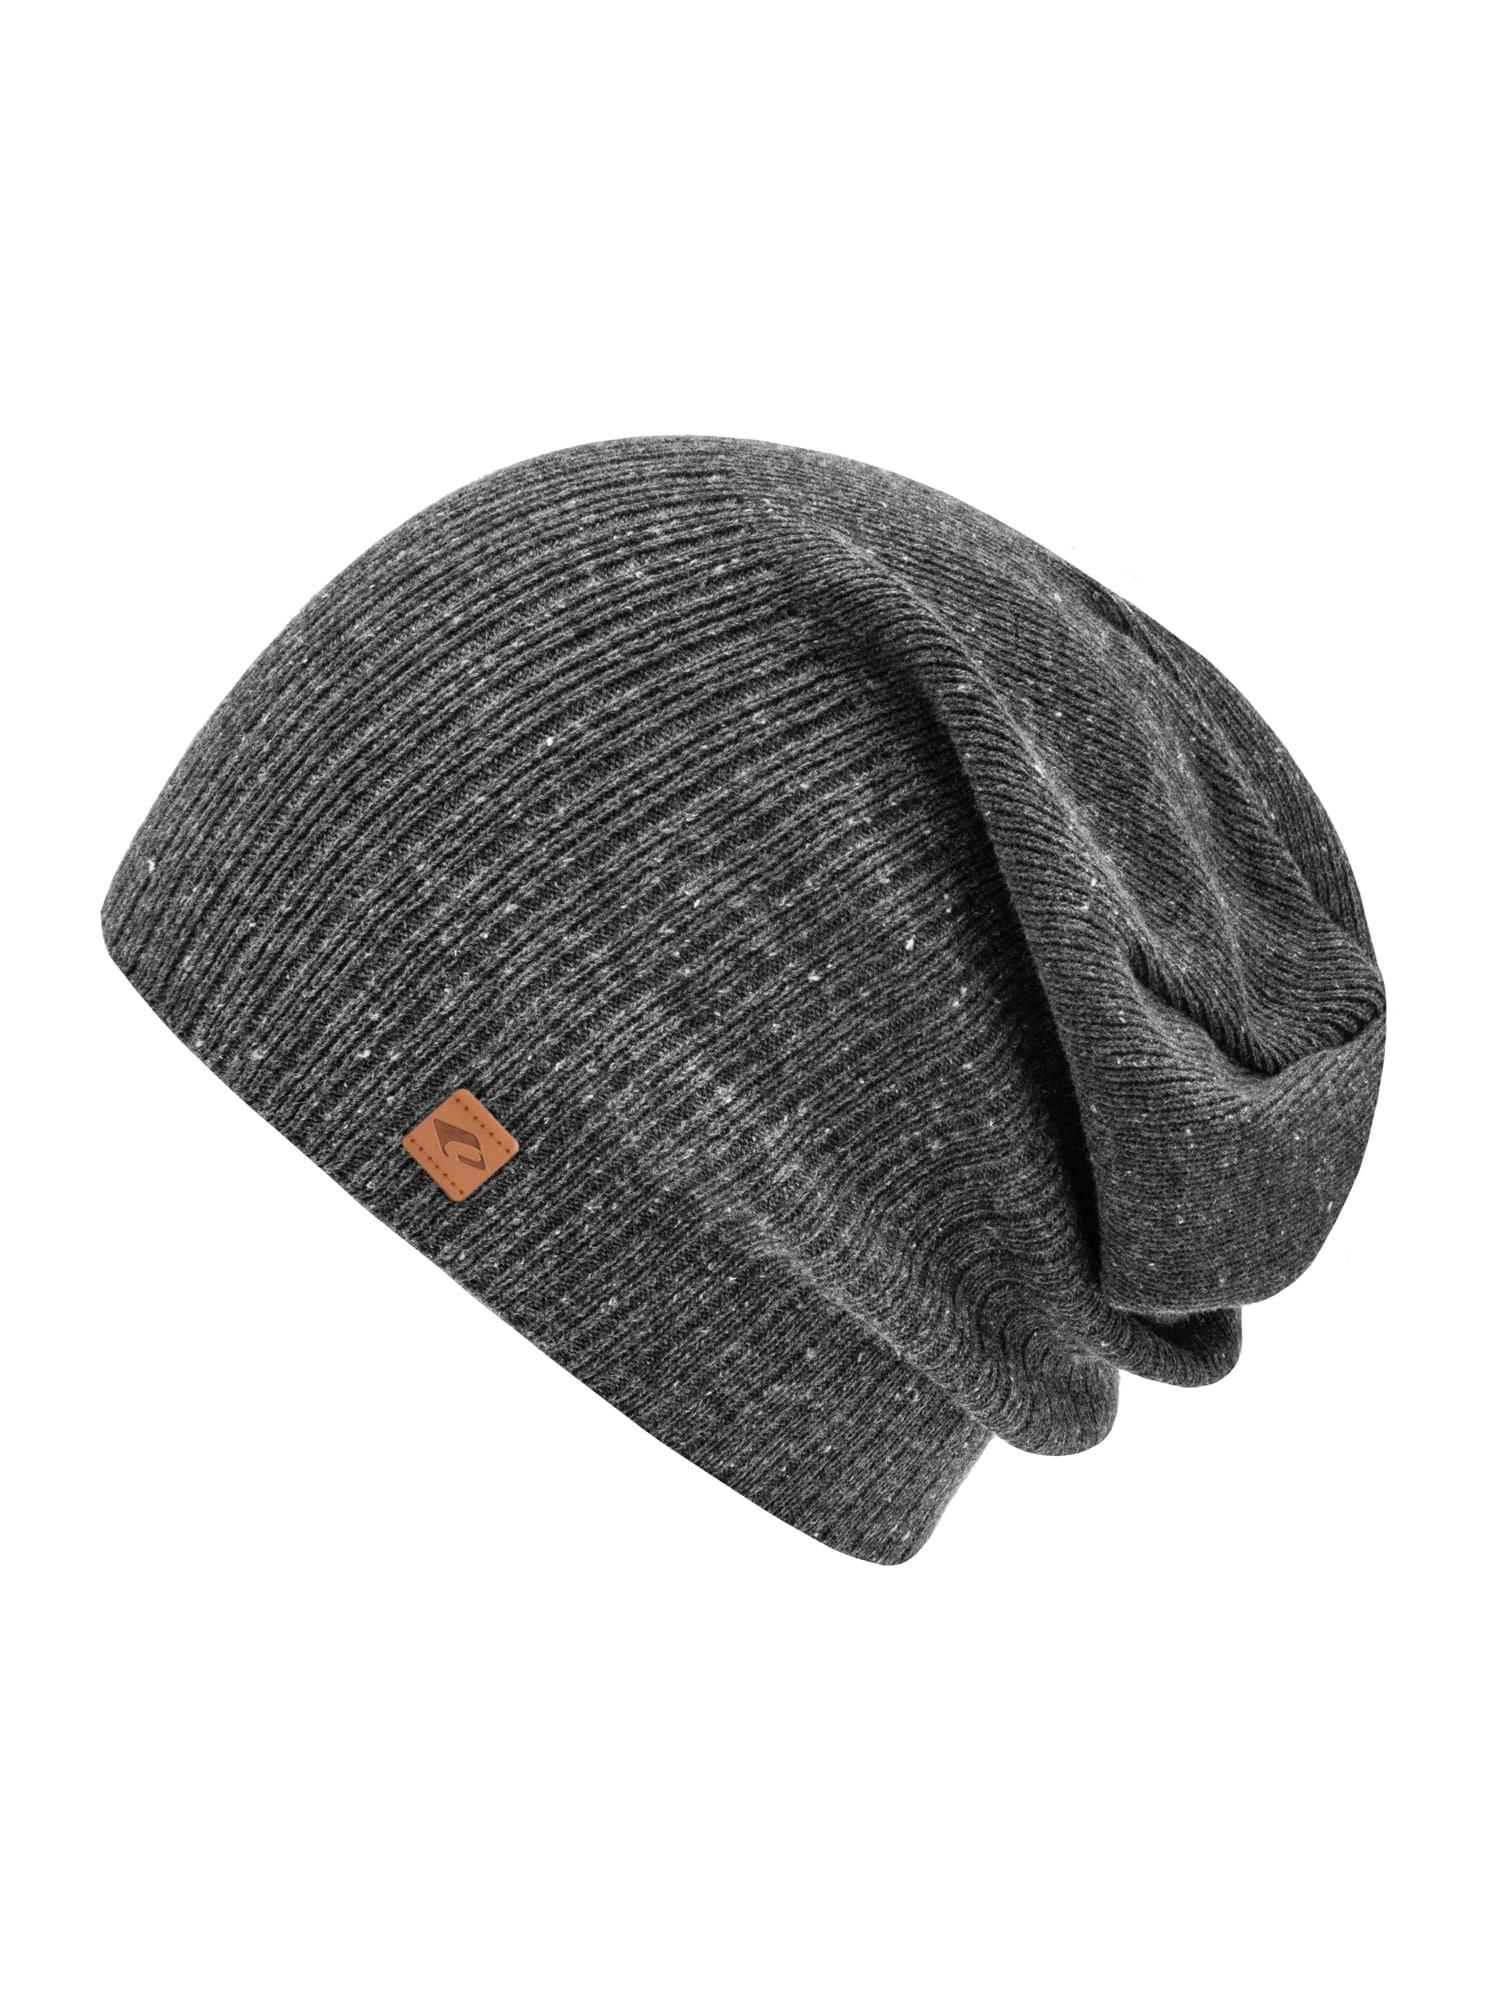 chillouts Megzta kepurė tamsiai pilka